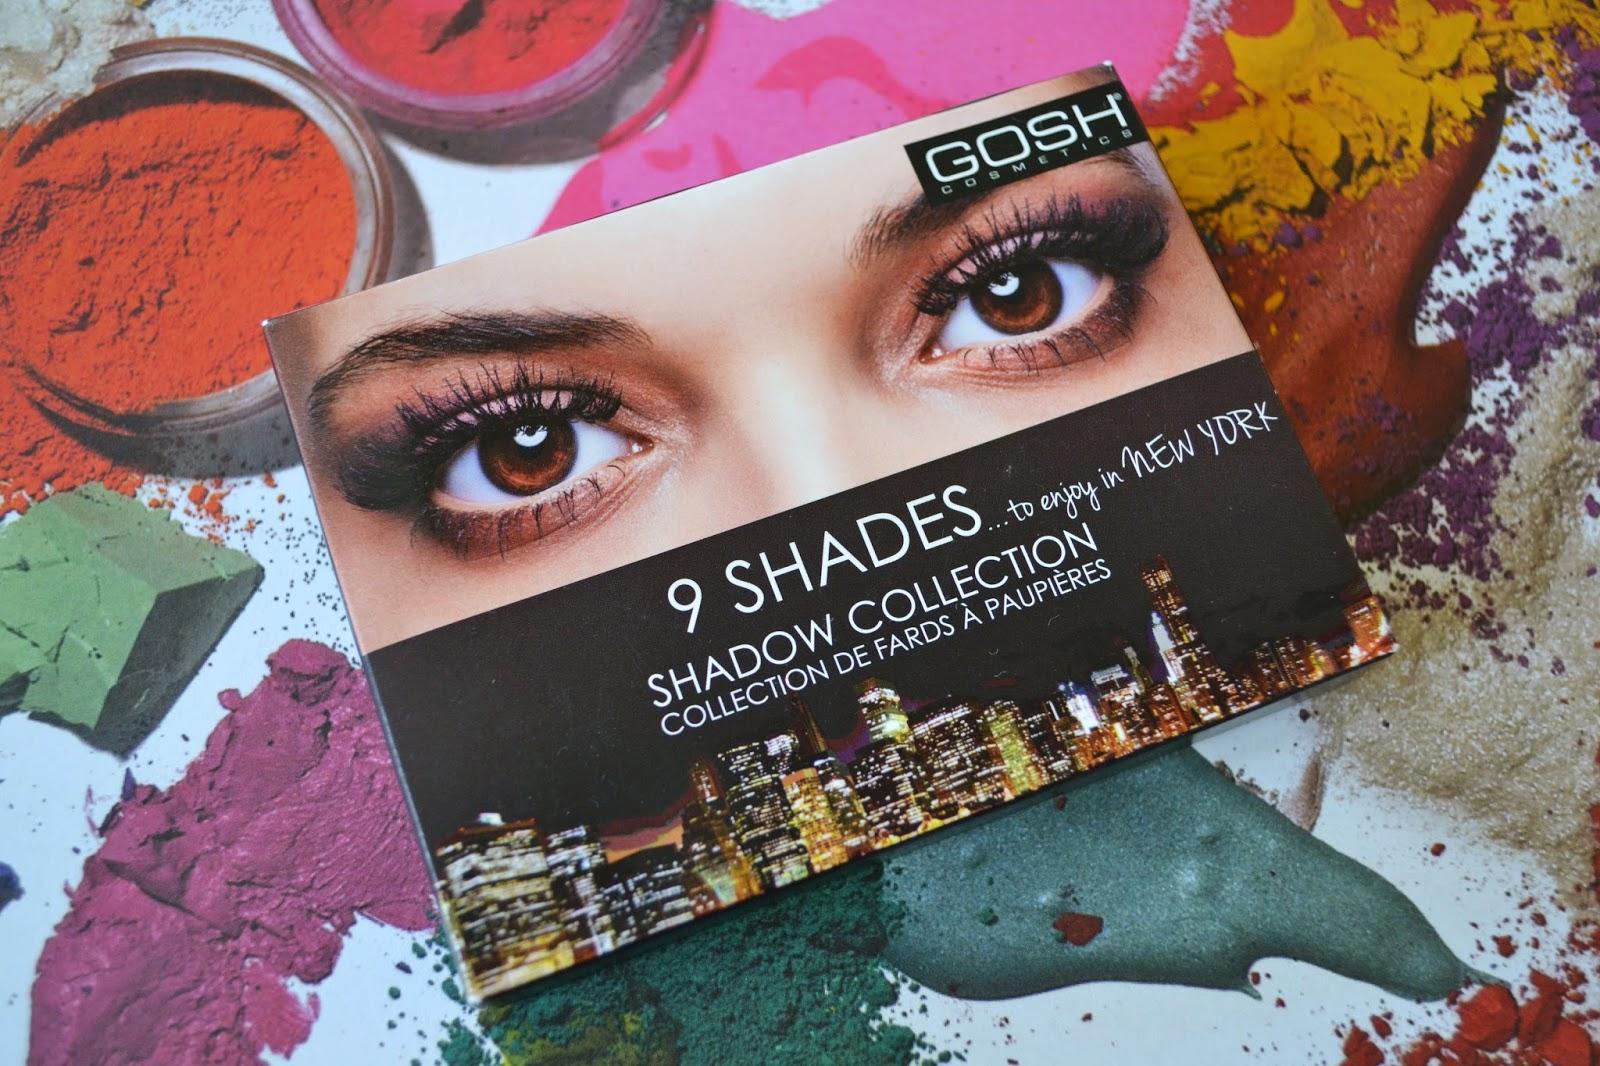 GOSH 9 Shades Eye Shadow Palette To Enjoy In New York - Aspiring Londoner